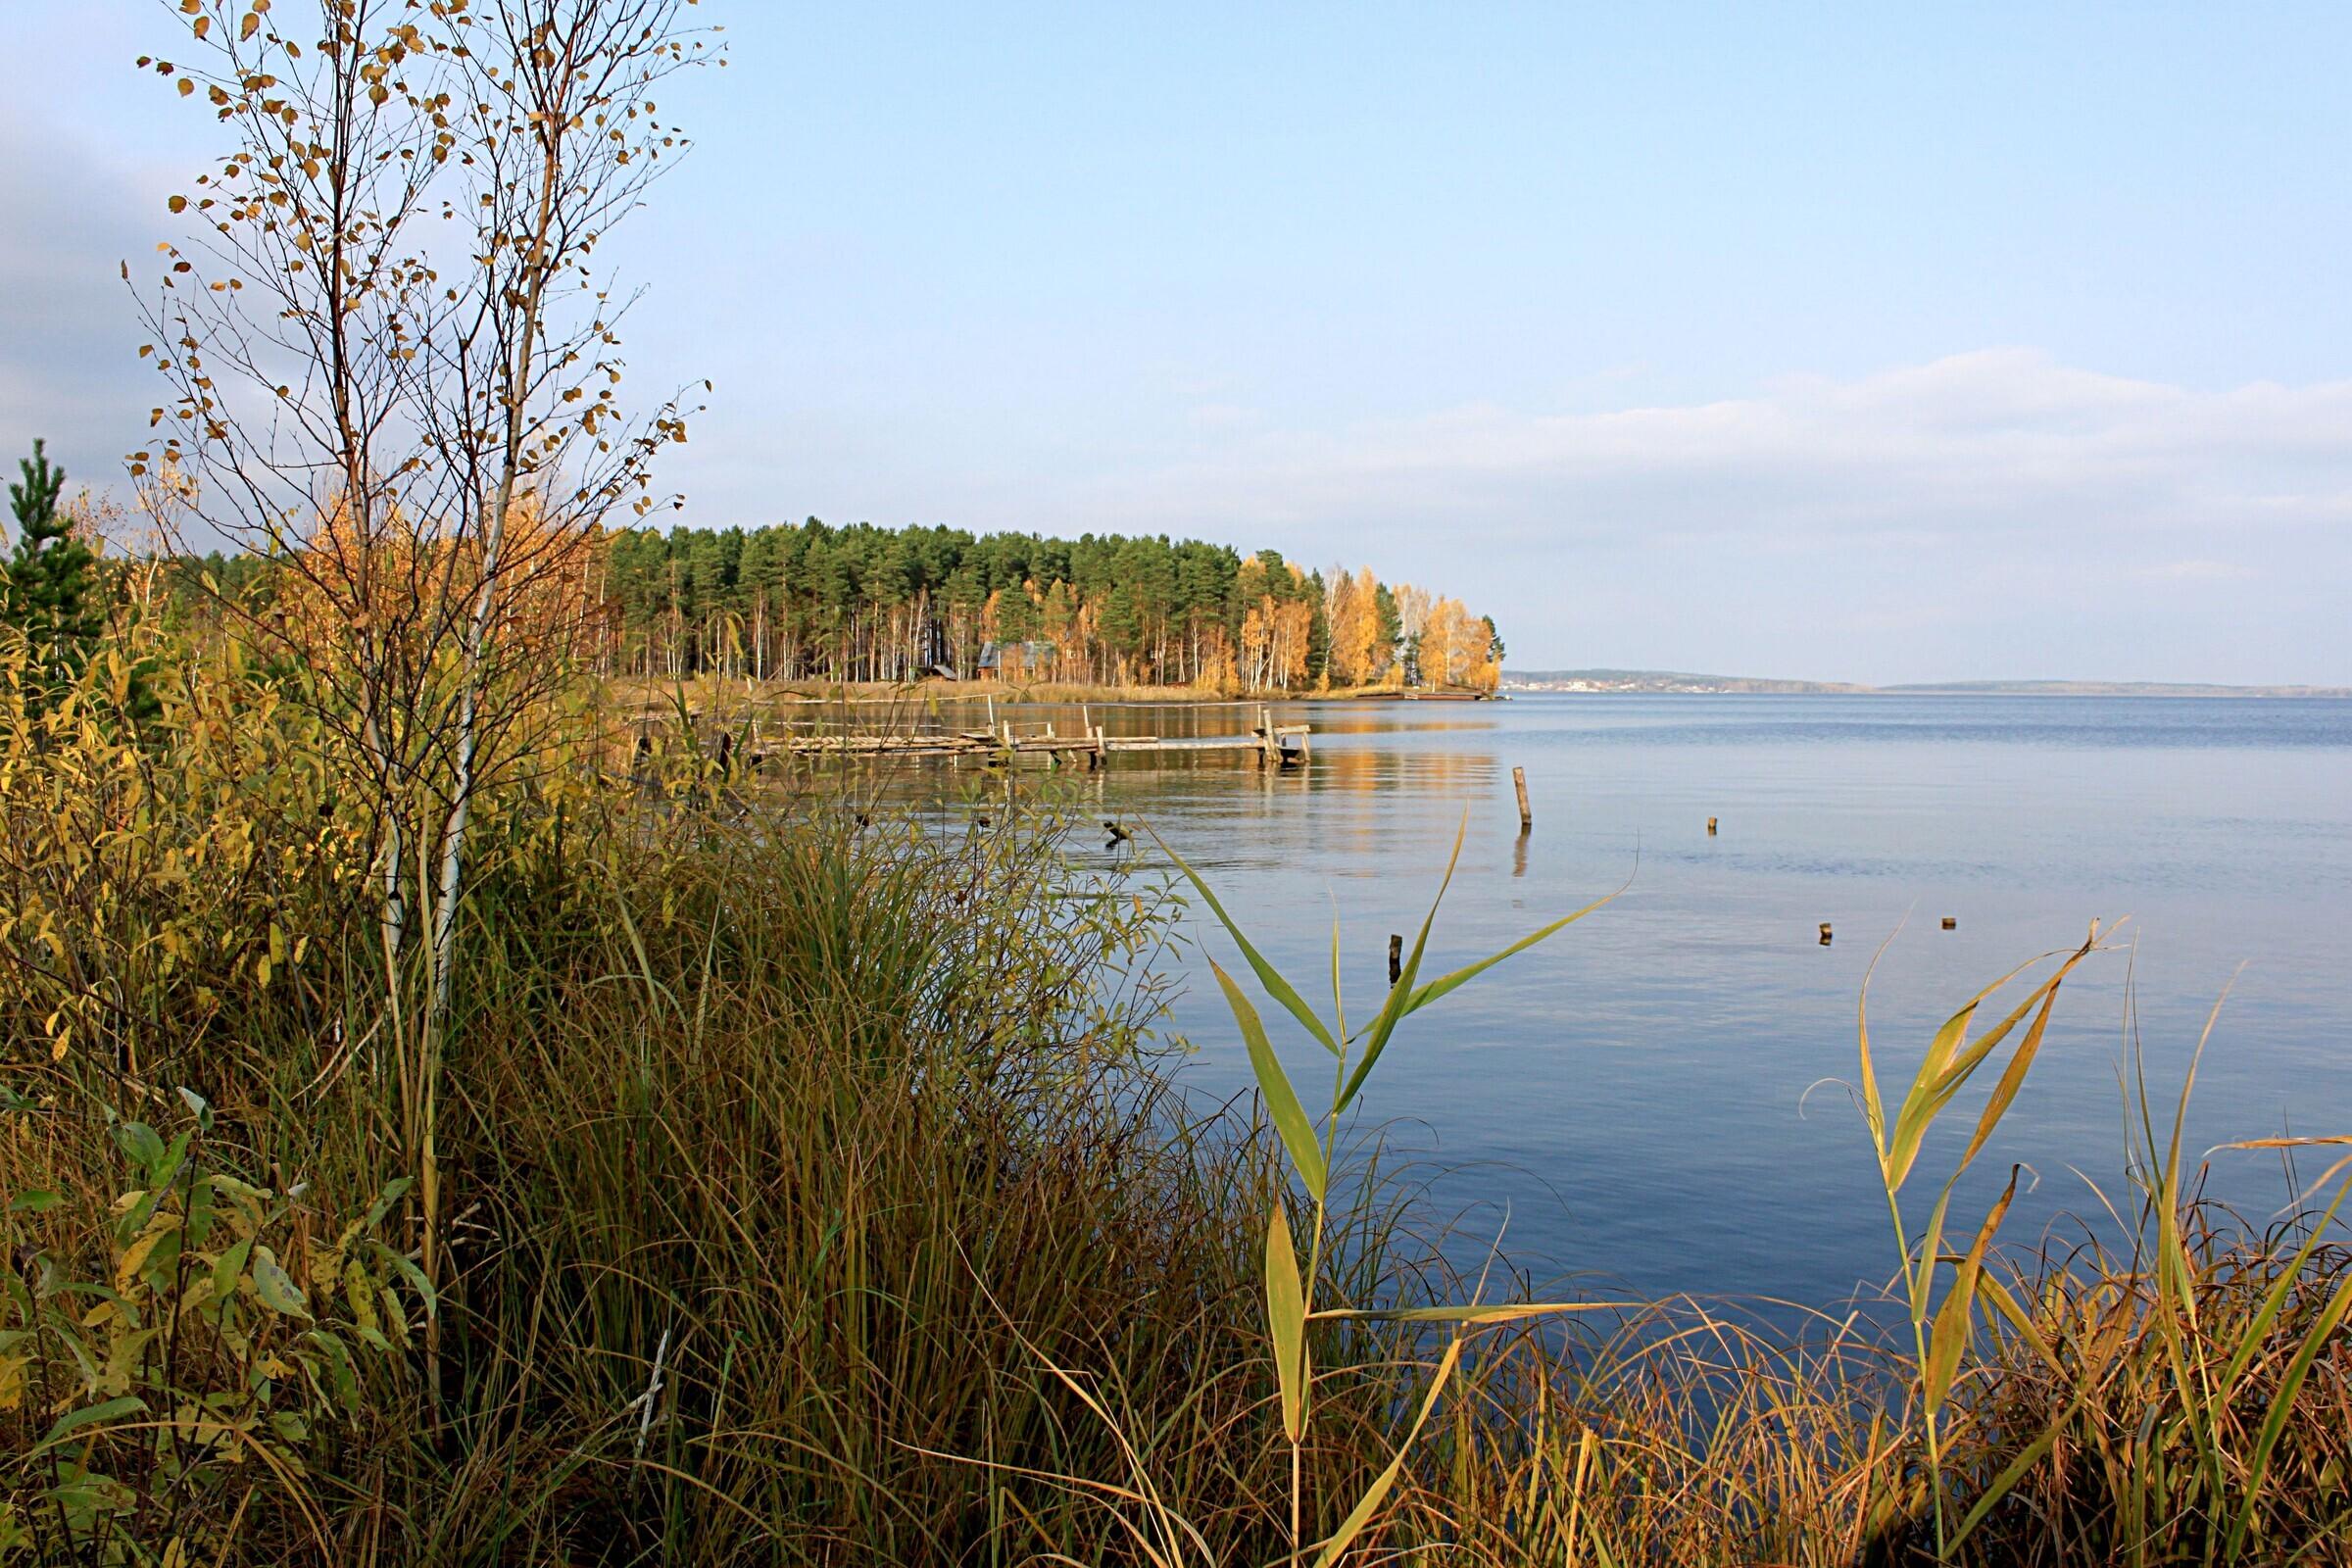 рыбалка озеро форум